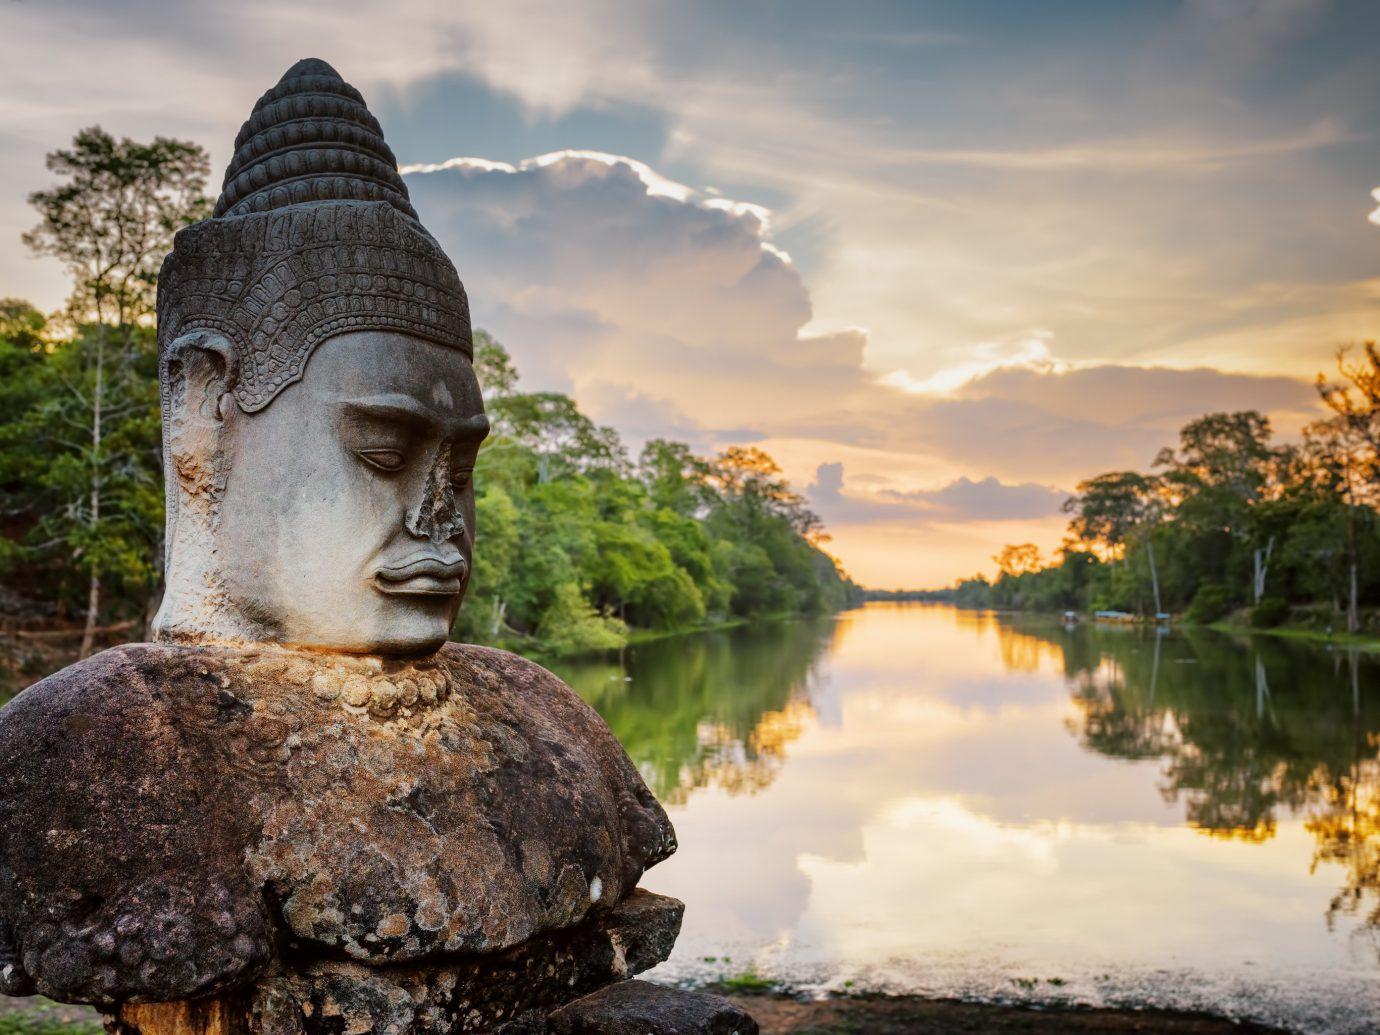 Budget Trip Ideas outdoor Nature tree reflection statue rock monument morning art sunlight temple autumn gautama buddha